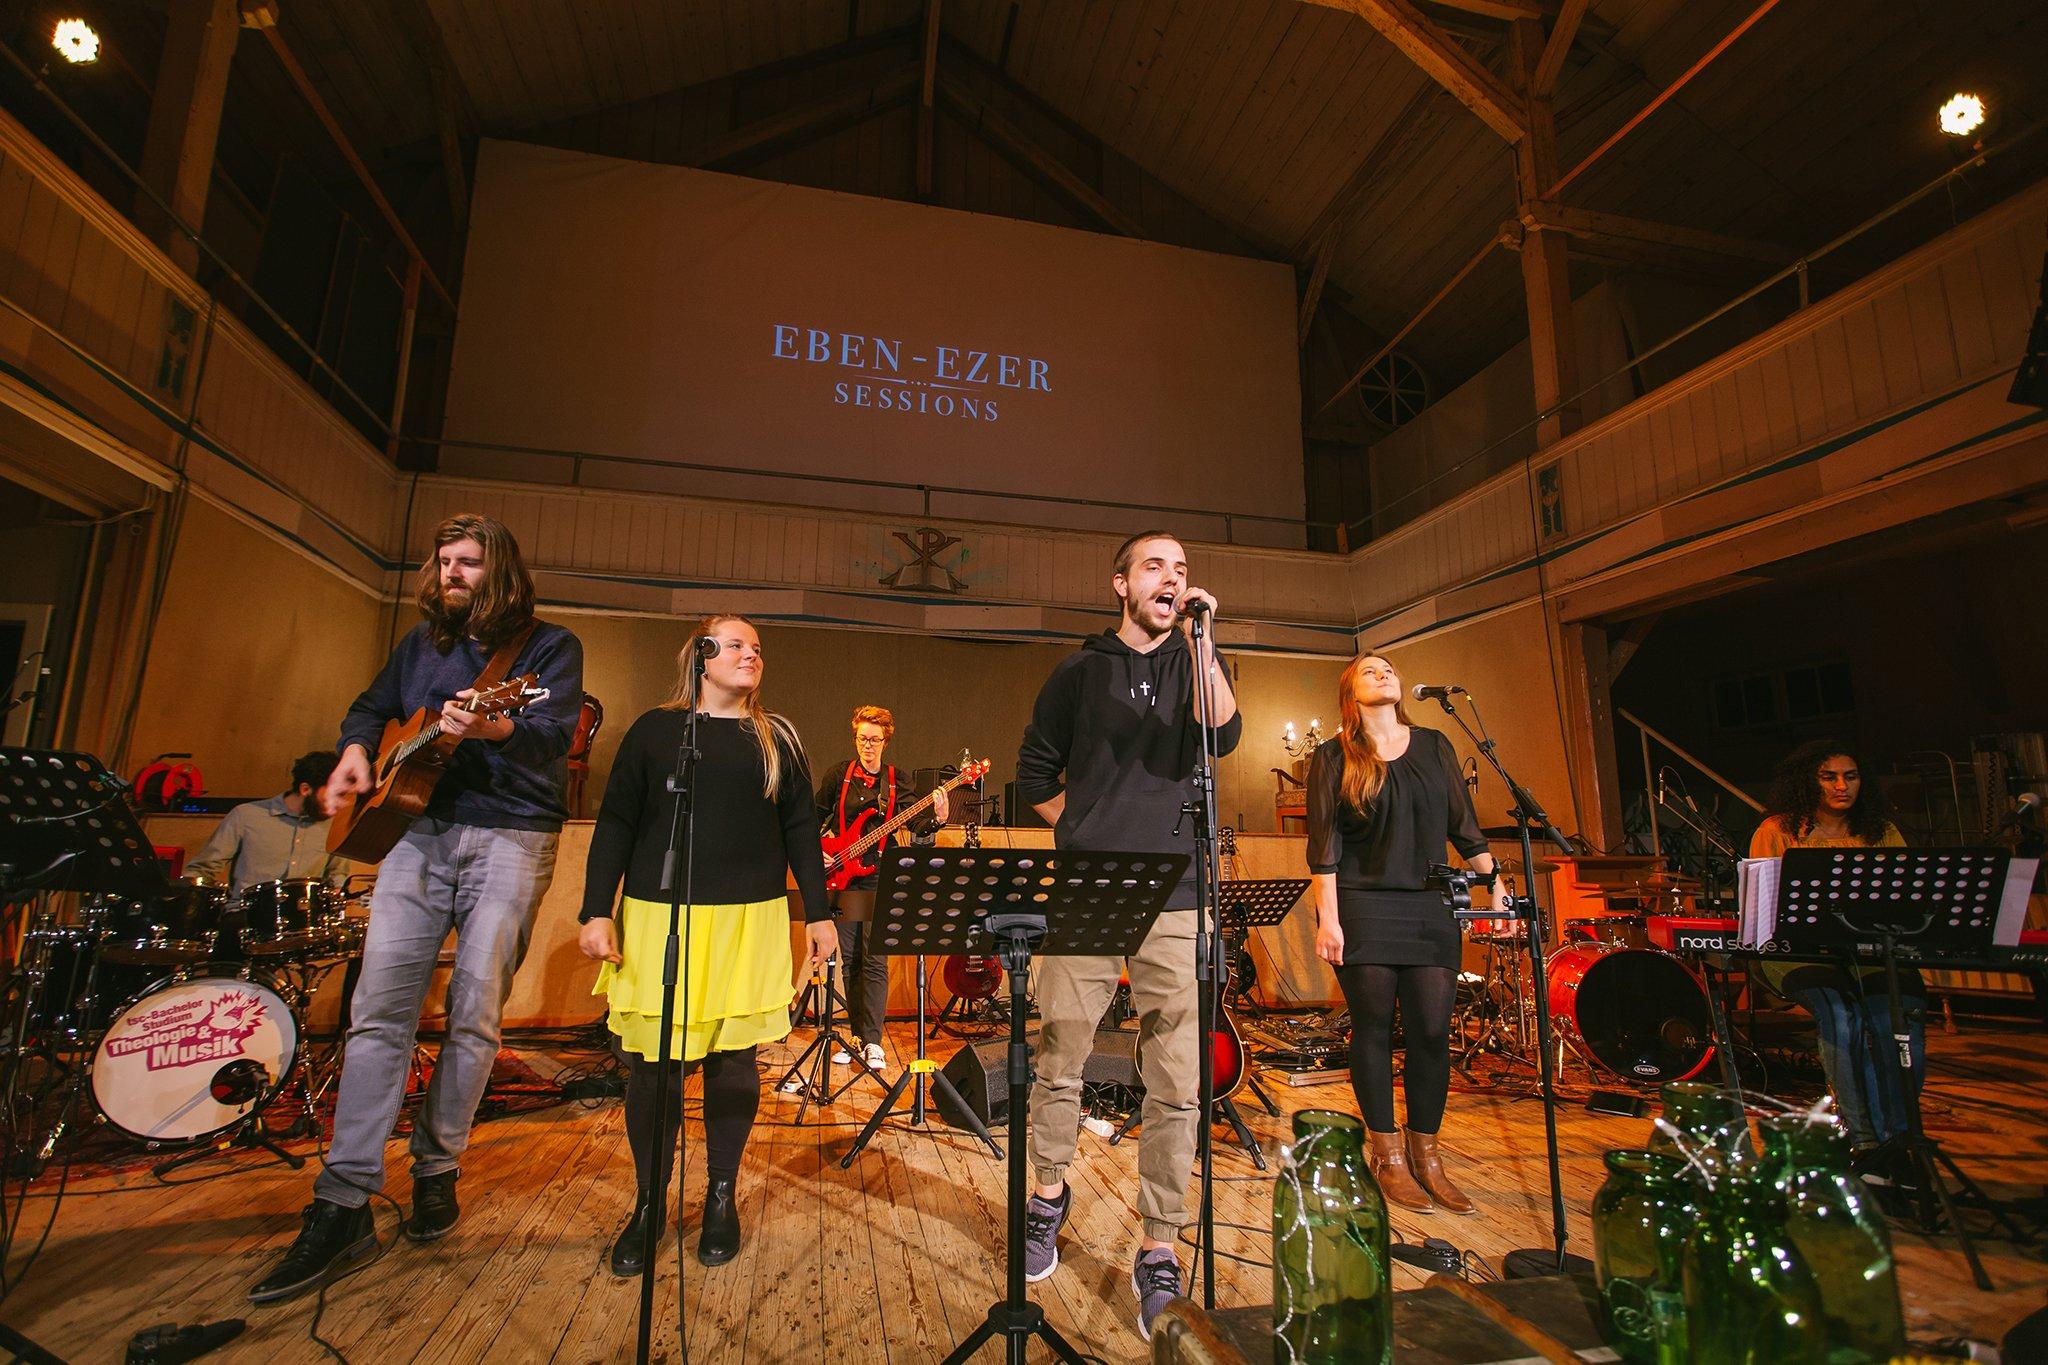 Eben-Ezer-Sessions am 18.10.2019: Robin Mauch mit Band (Foto: Knut Burmeister, ALLTAG)